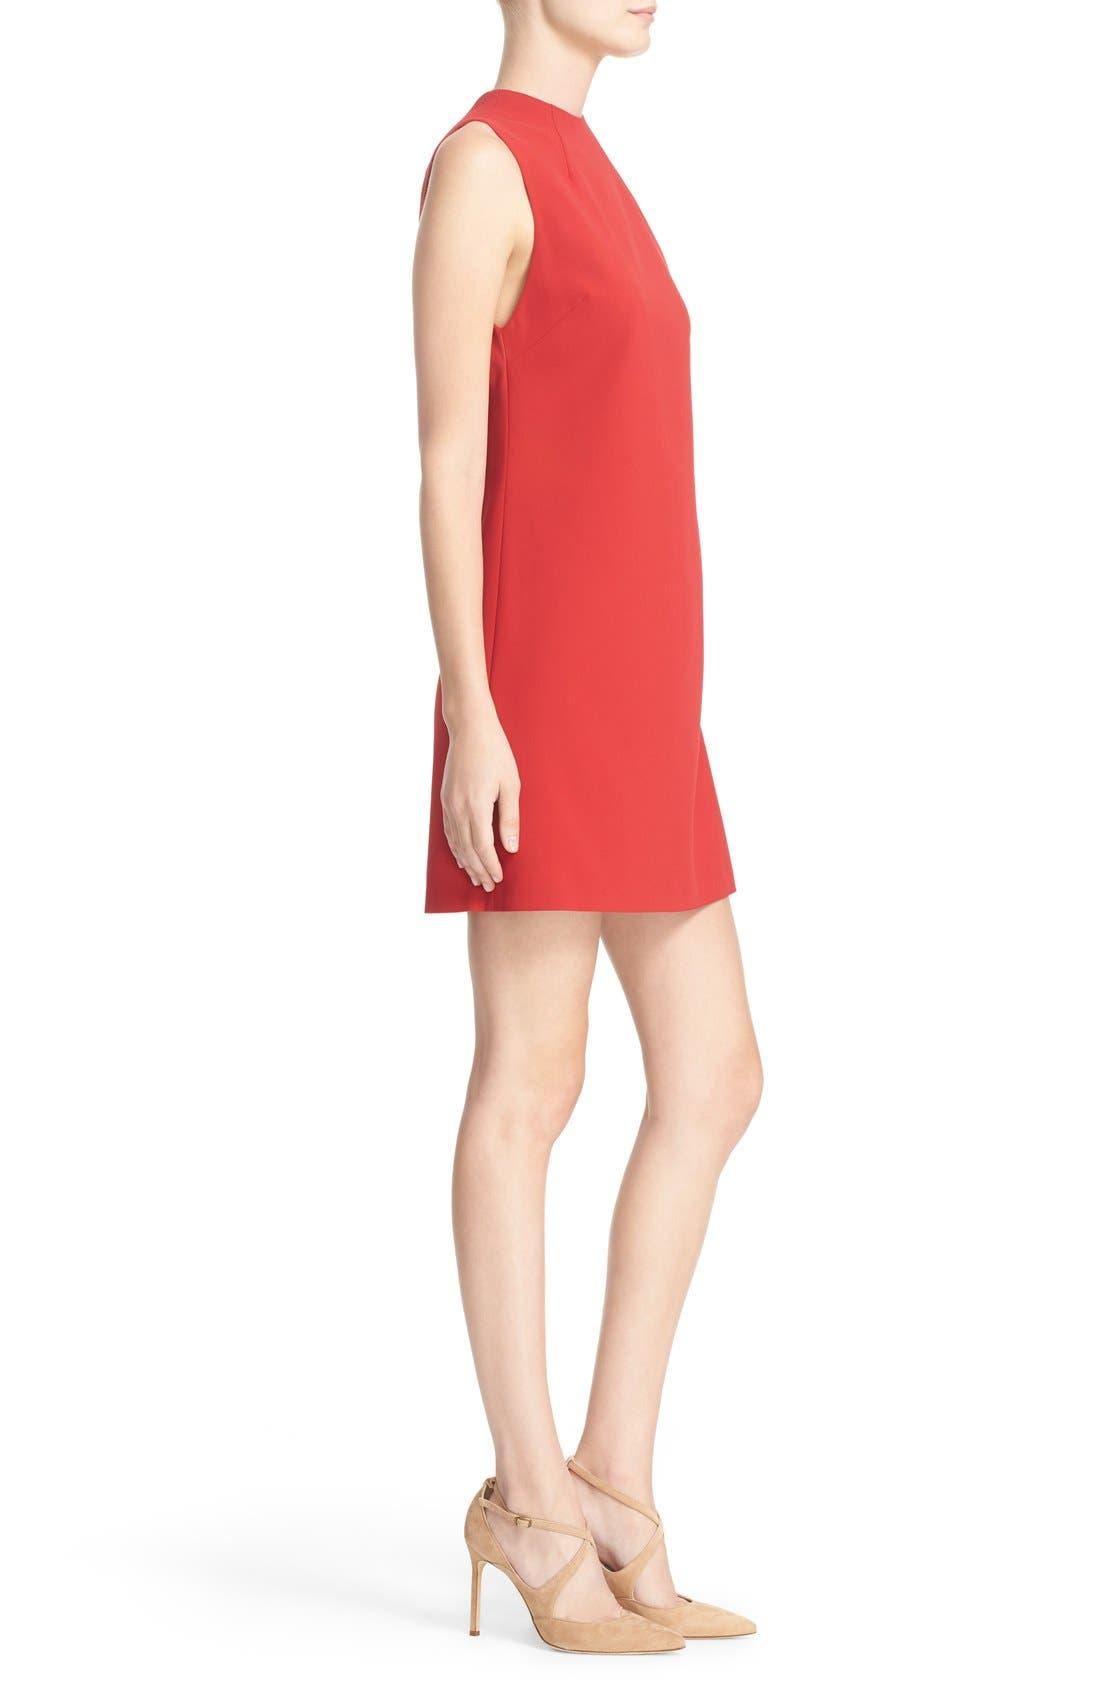 ALICE + OLIVIA,                             'Coley' Mock Neck A-Line Dress,                             Alternate thumbnail 5, color,                             623